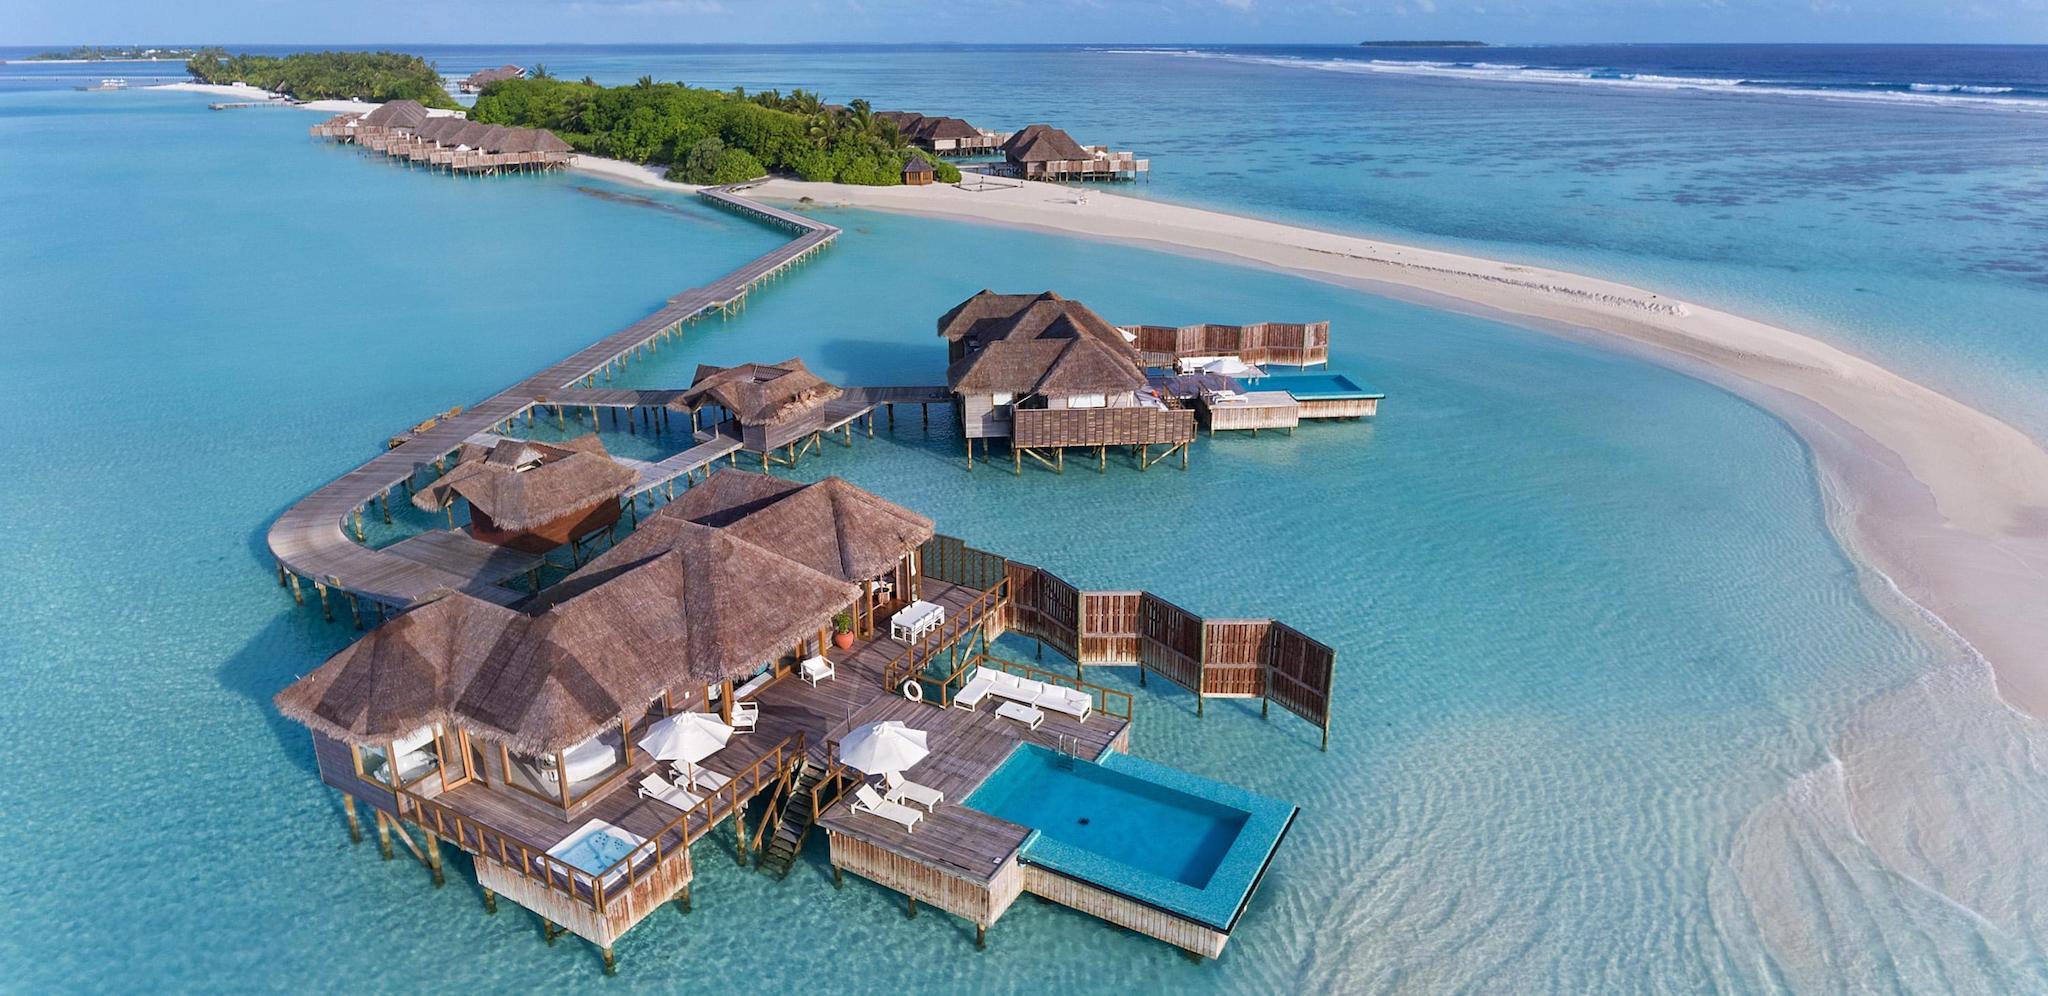 conrad_maldives_3.jpg